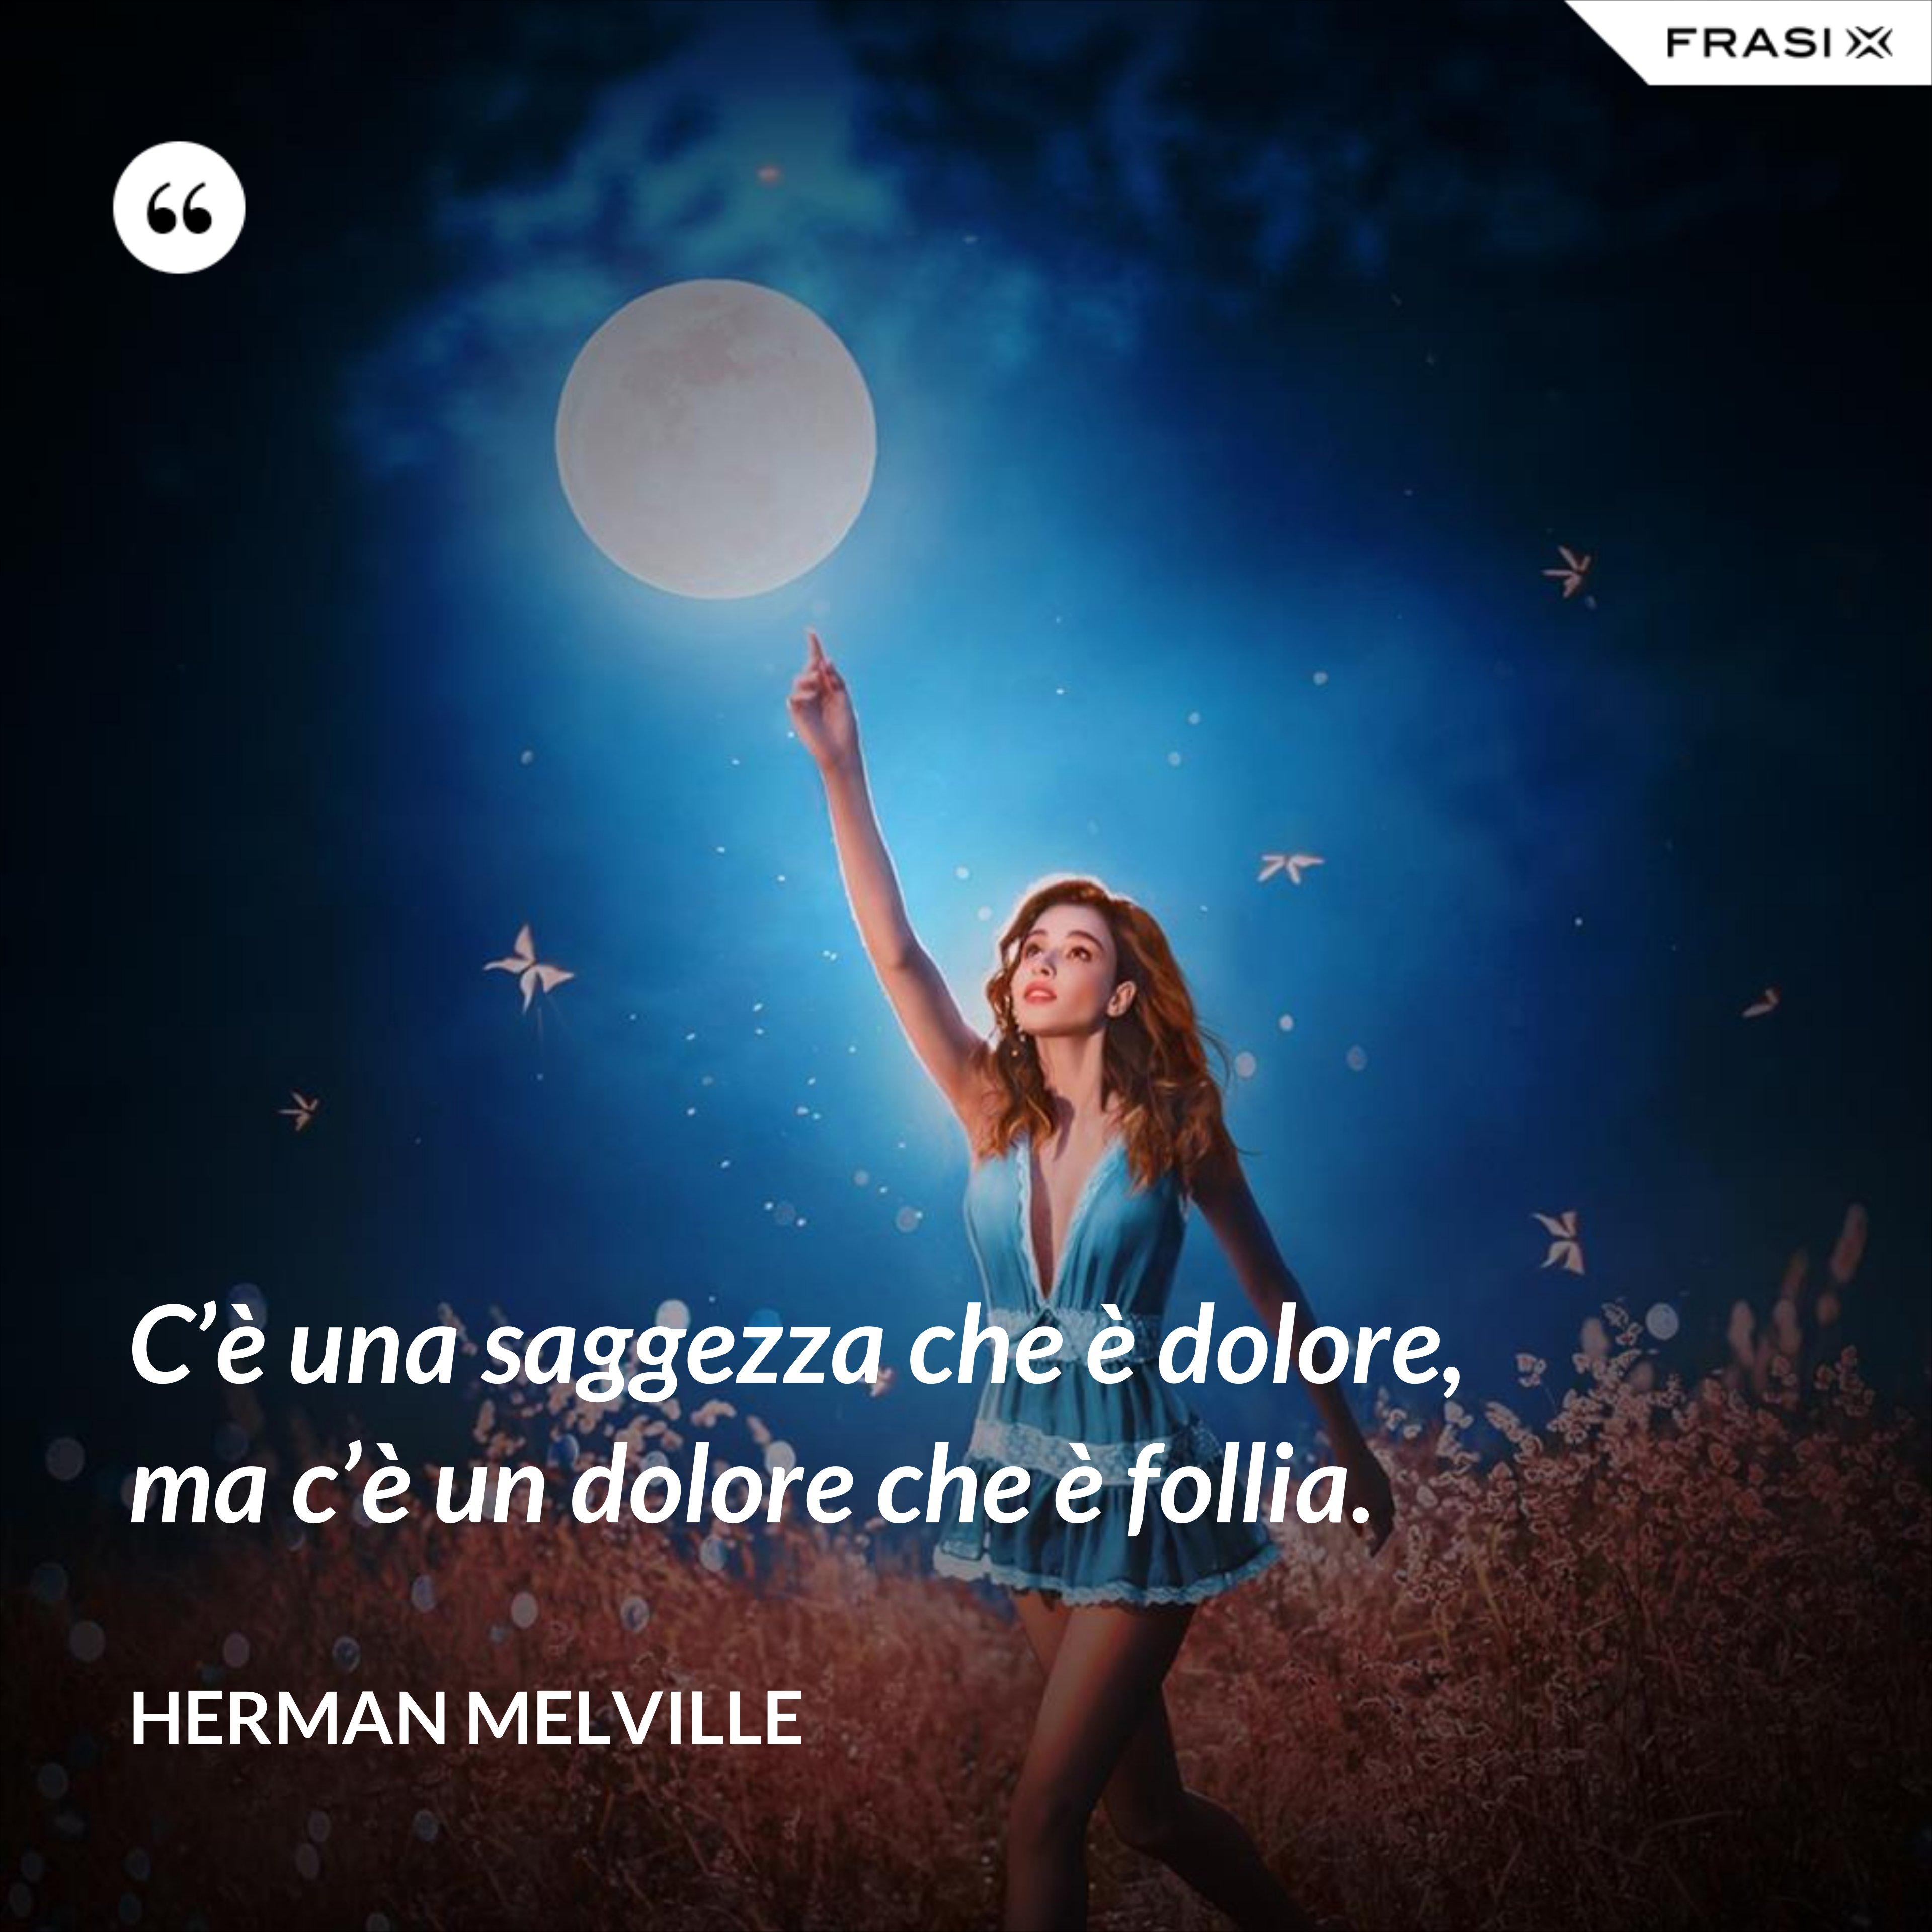 C'è una saggezza che è dolore, ma c'è un dolore che è follia. - Herman Melville